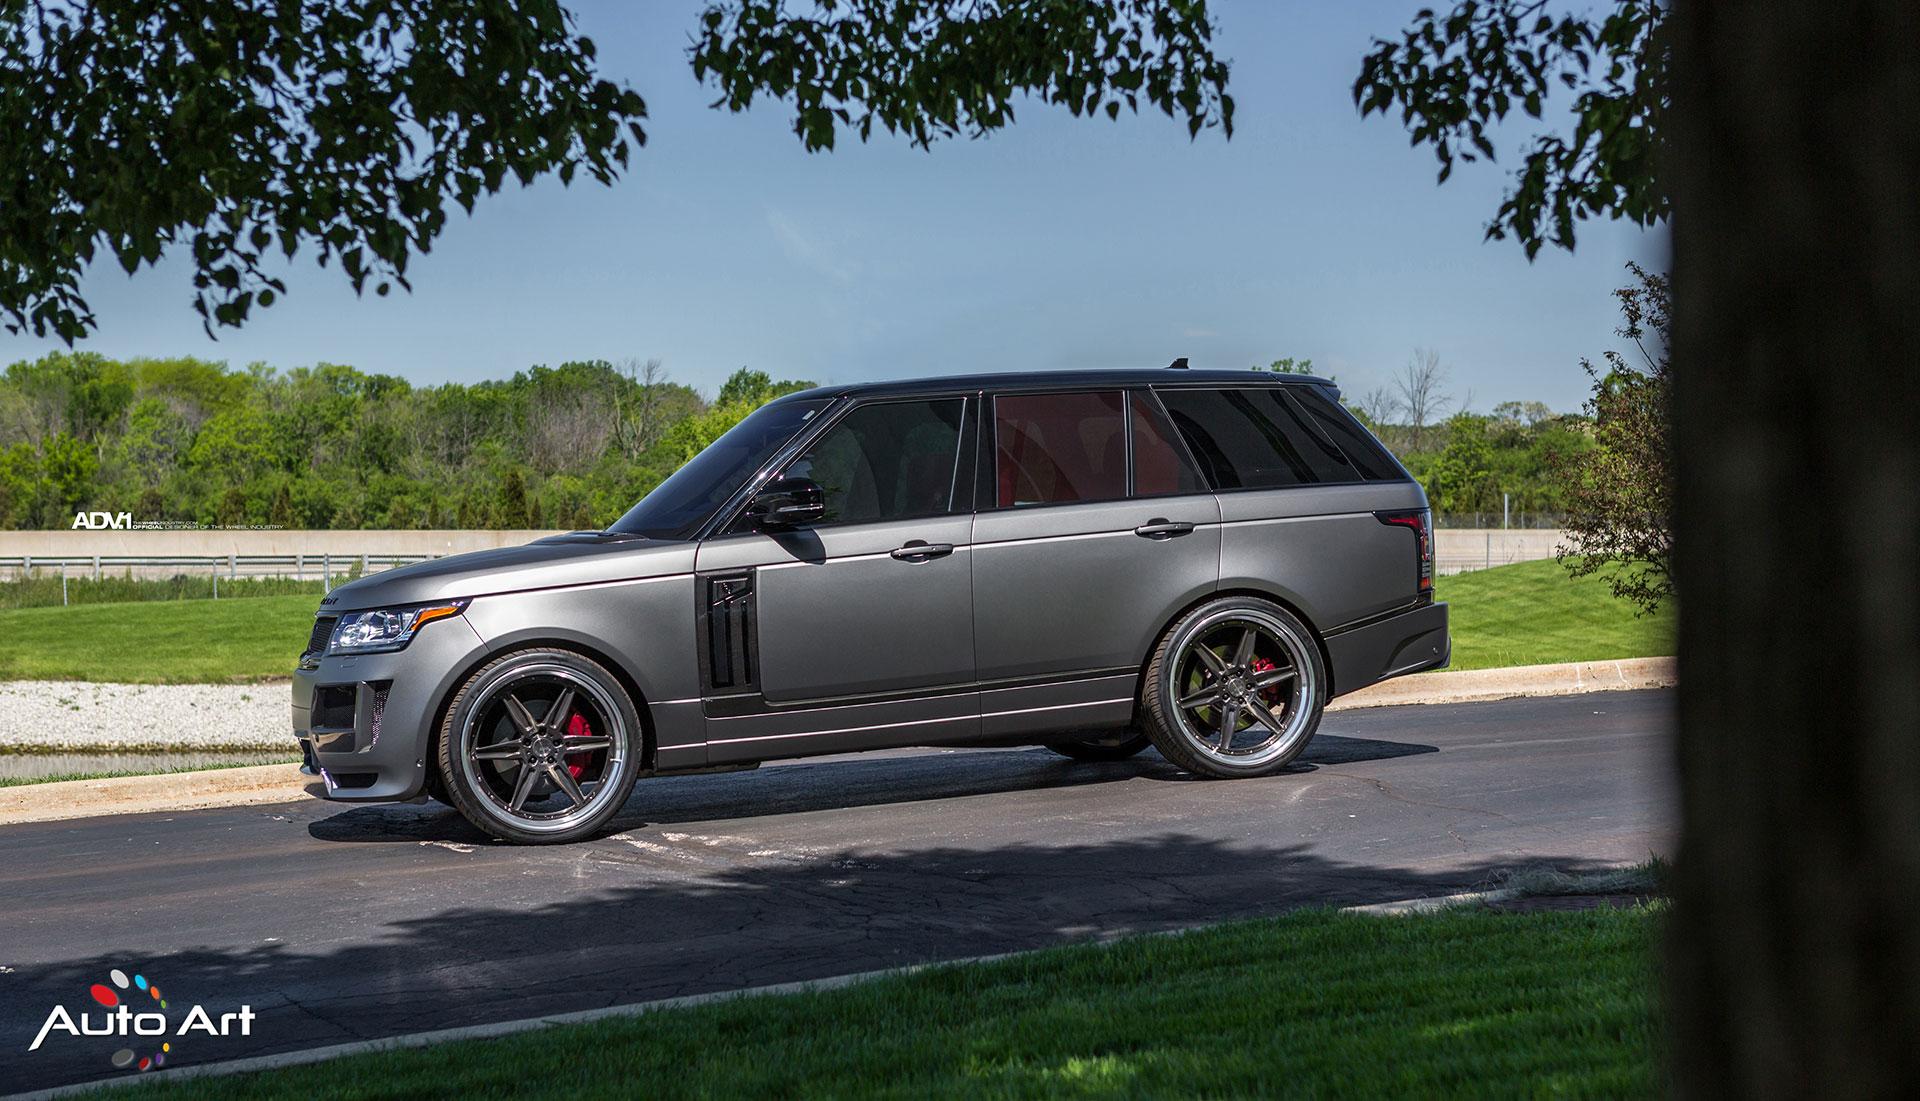 Range Rover Autobiography ADV6 Track Function CS Concave Wheels